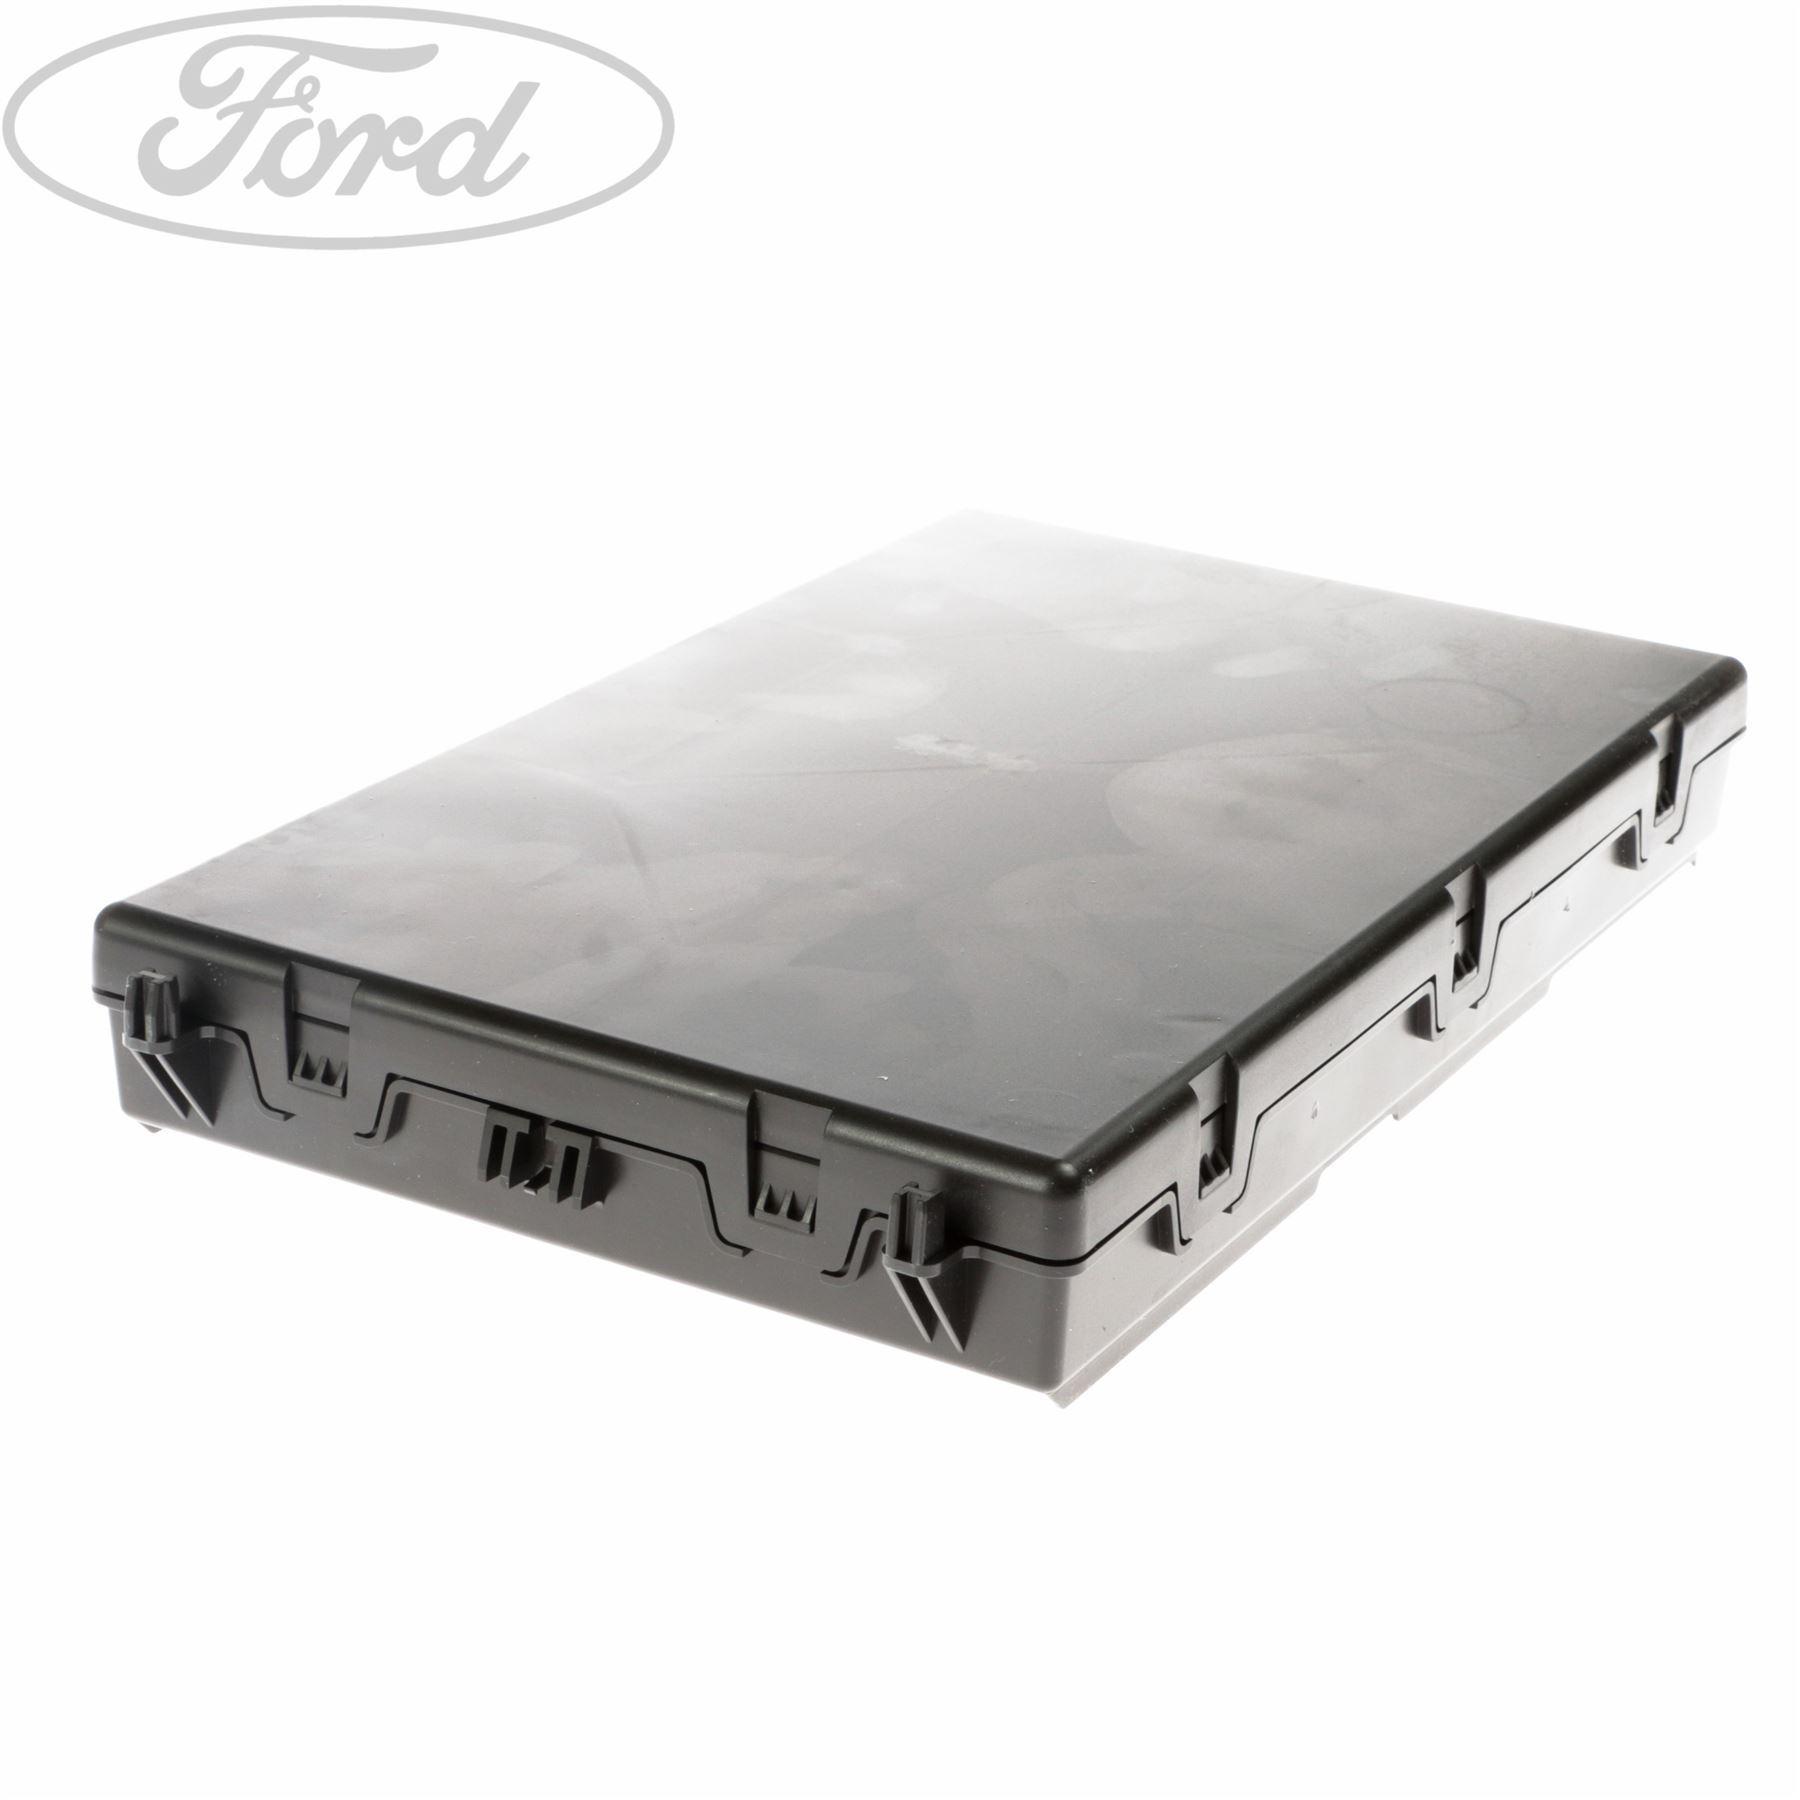 Genuine Ford Transit Mk7 Fuse Junction Panel 2019449 Ebay Mk6 Box